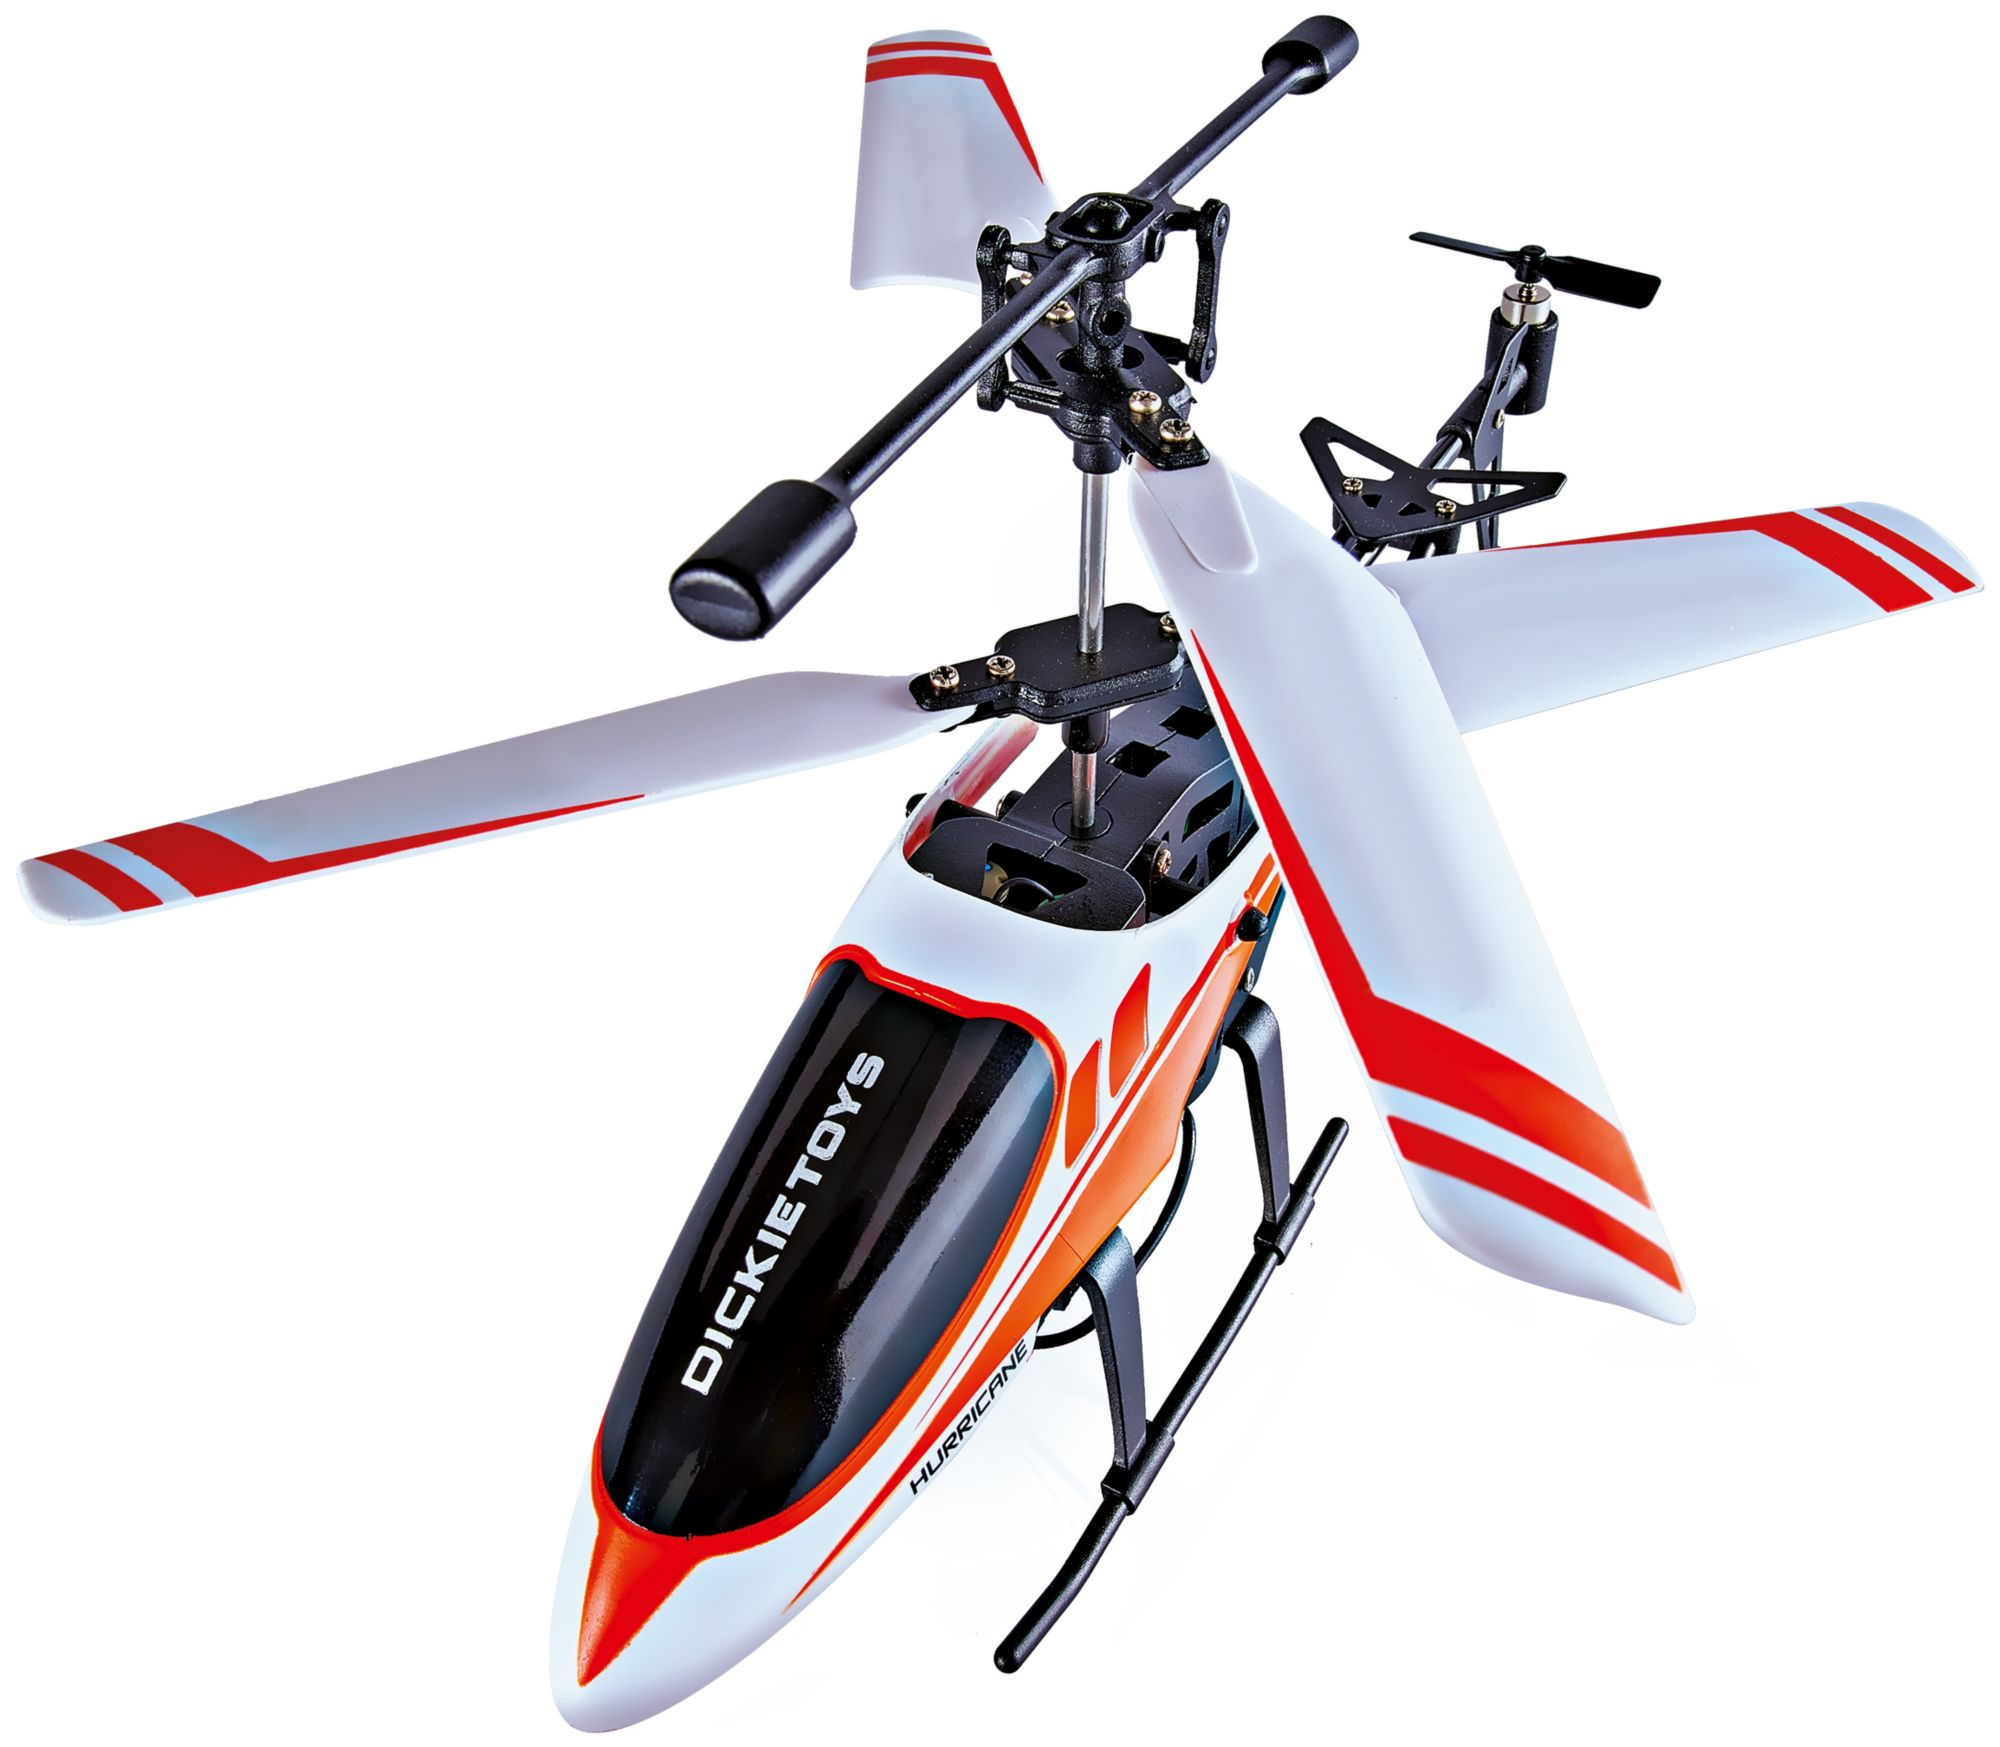 DICKIE TOYS Dickie Toys RC Hubschrauber, »DT-H2 Heli Hurricane«